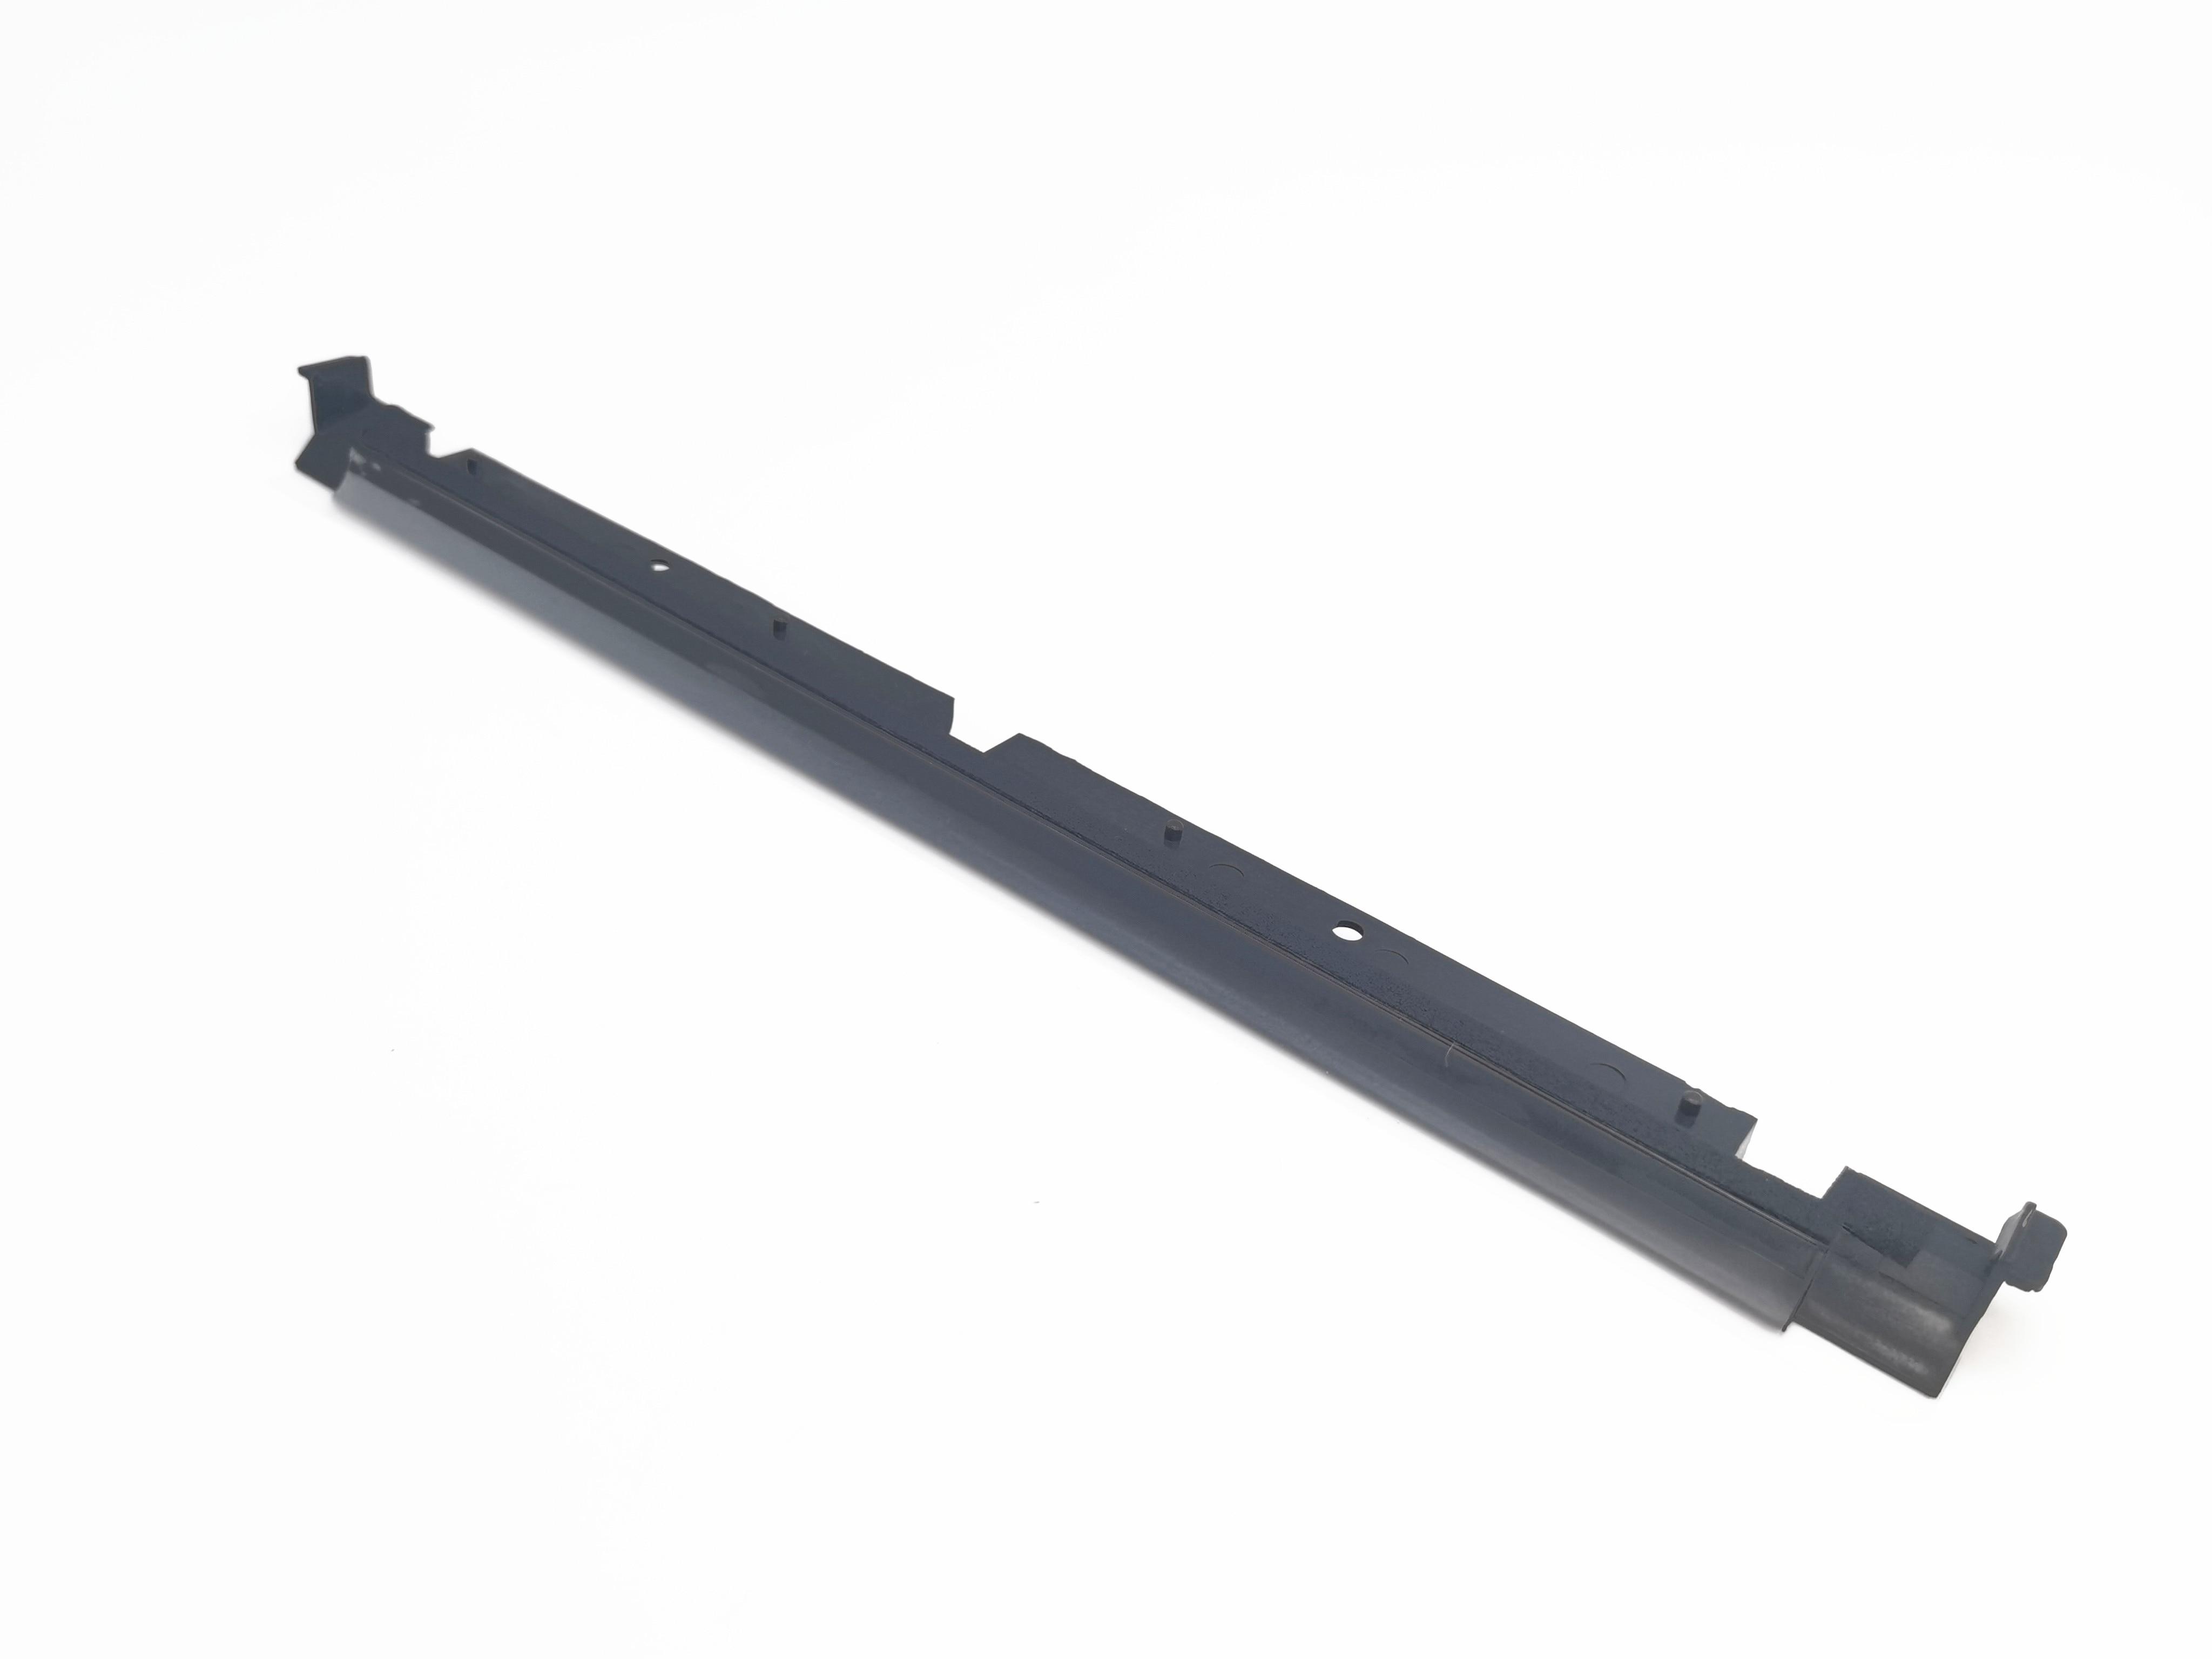 10 шт. барабанный блок EANTRANCE SEAL B110-3091 для RICOH MP7500 AFICIO 2075 2060 1060 1075 MP8000 MP8001 MP9002 7502